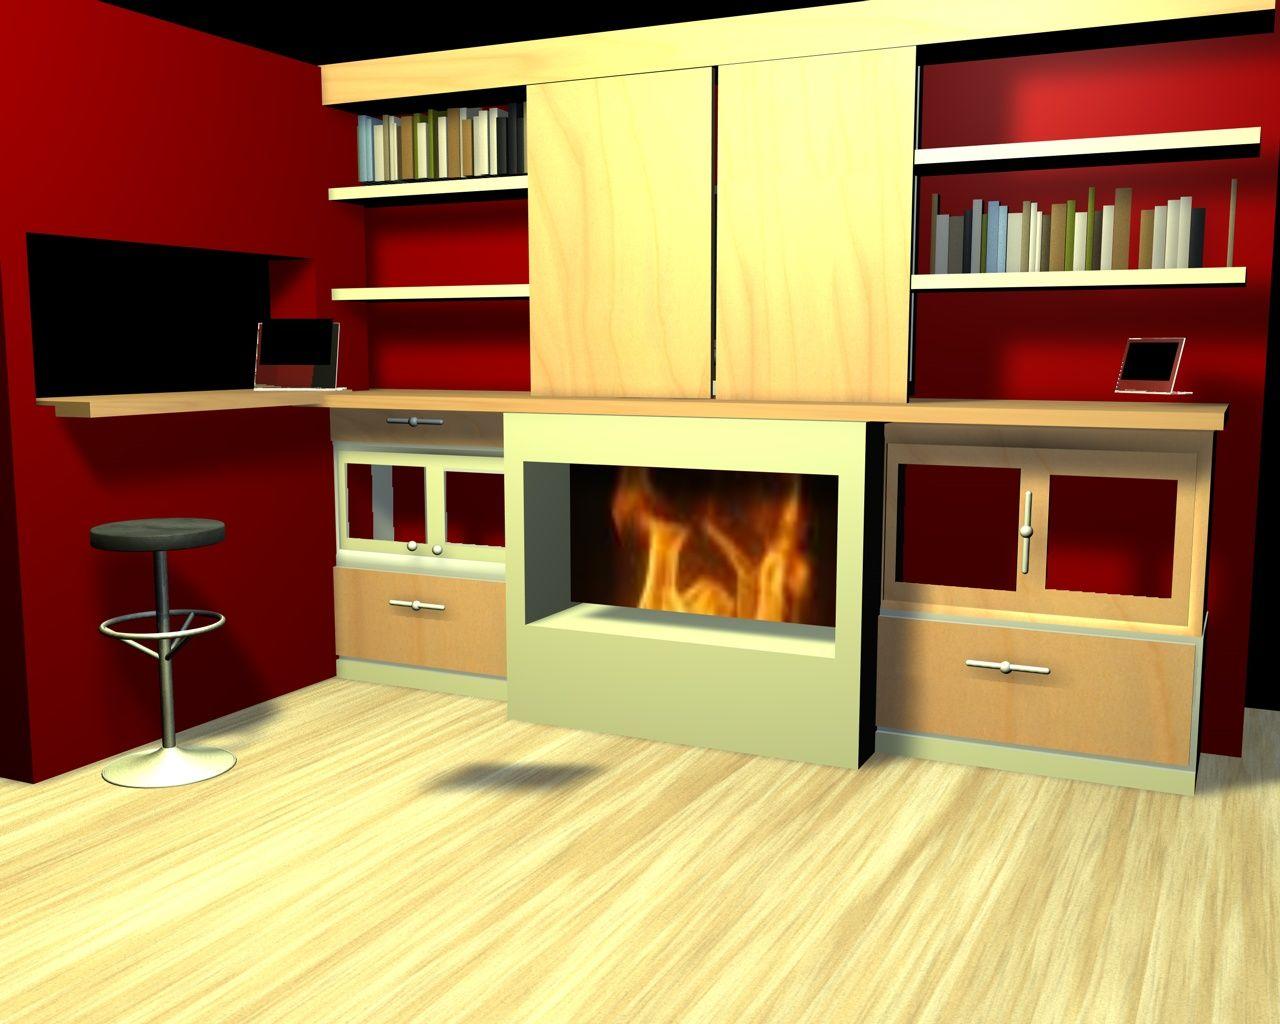 Dise o de mueble para salon con chimenea y television - Chimeneas para salon ...